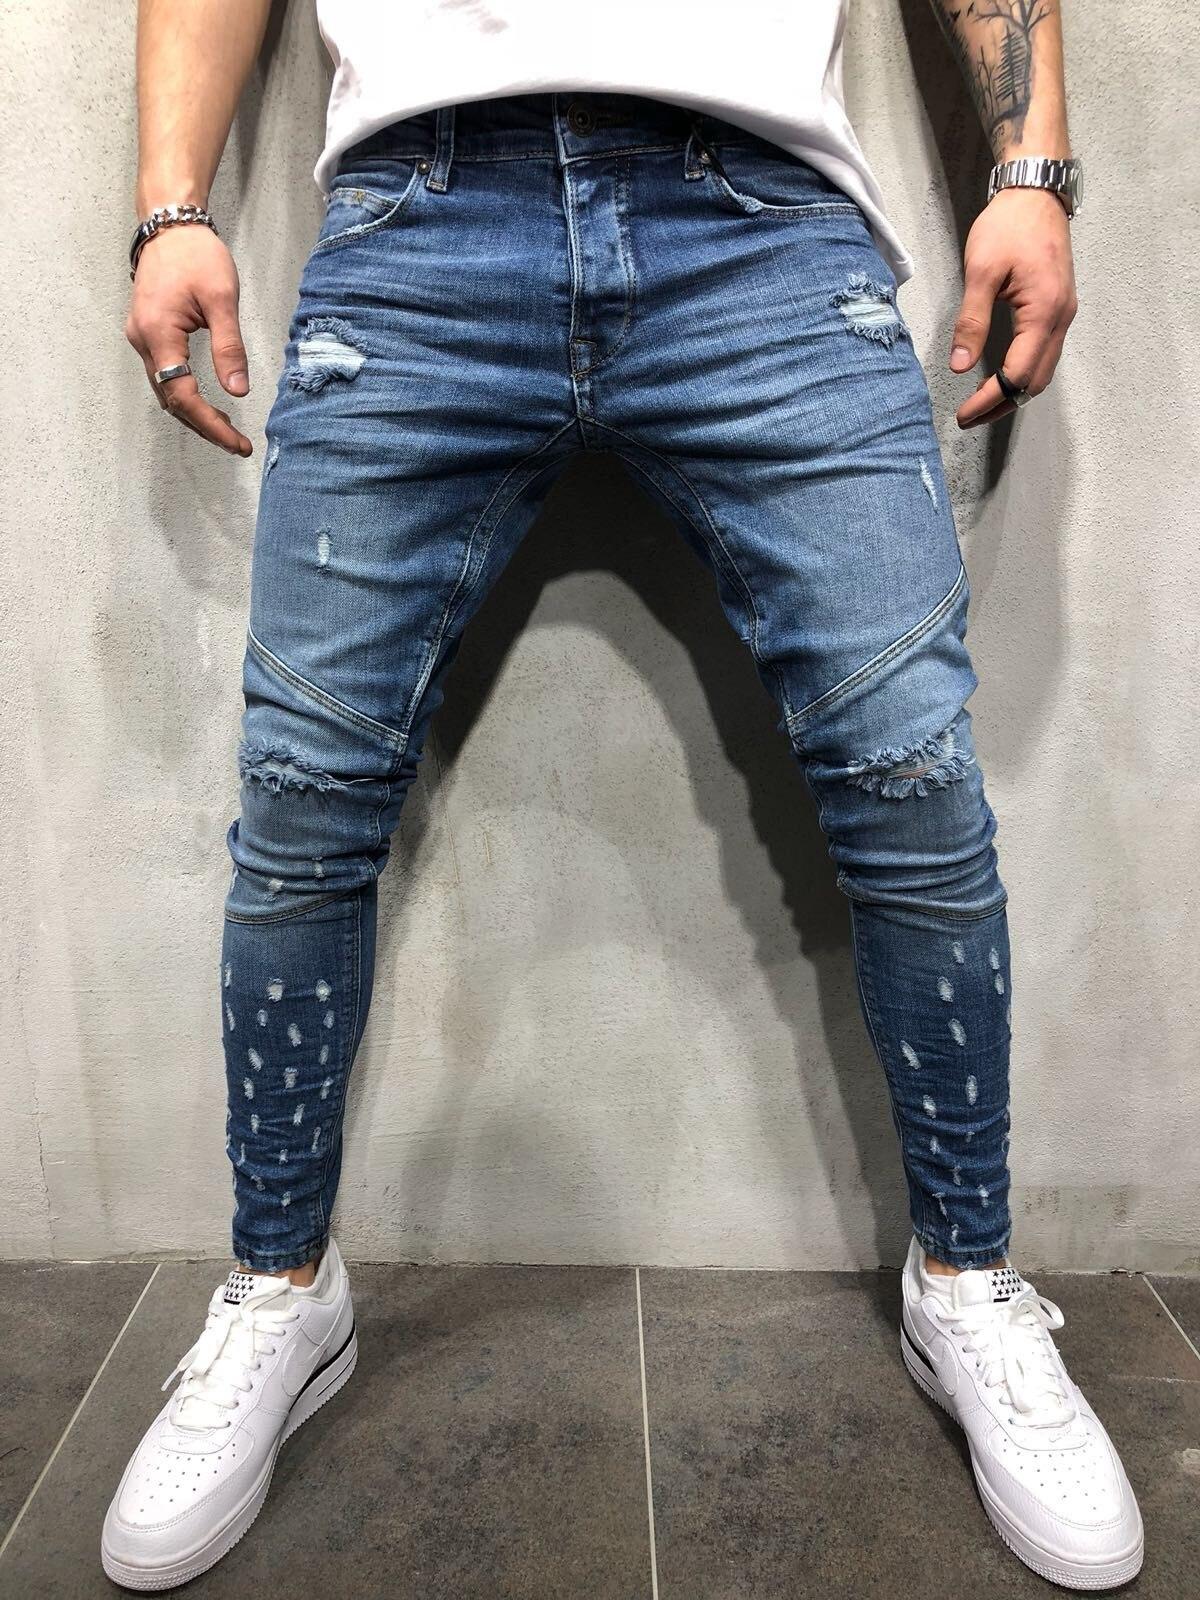 Mens Punk Jeans Jogger Hip Hop Denim Pants Biker Ripped Holes Slim Fit Stretchy